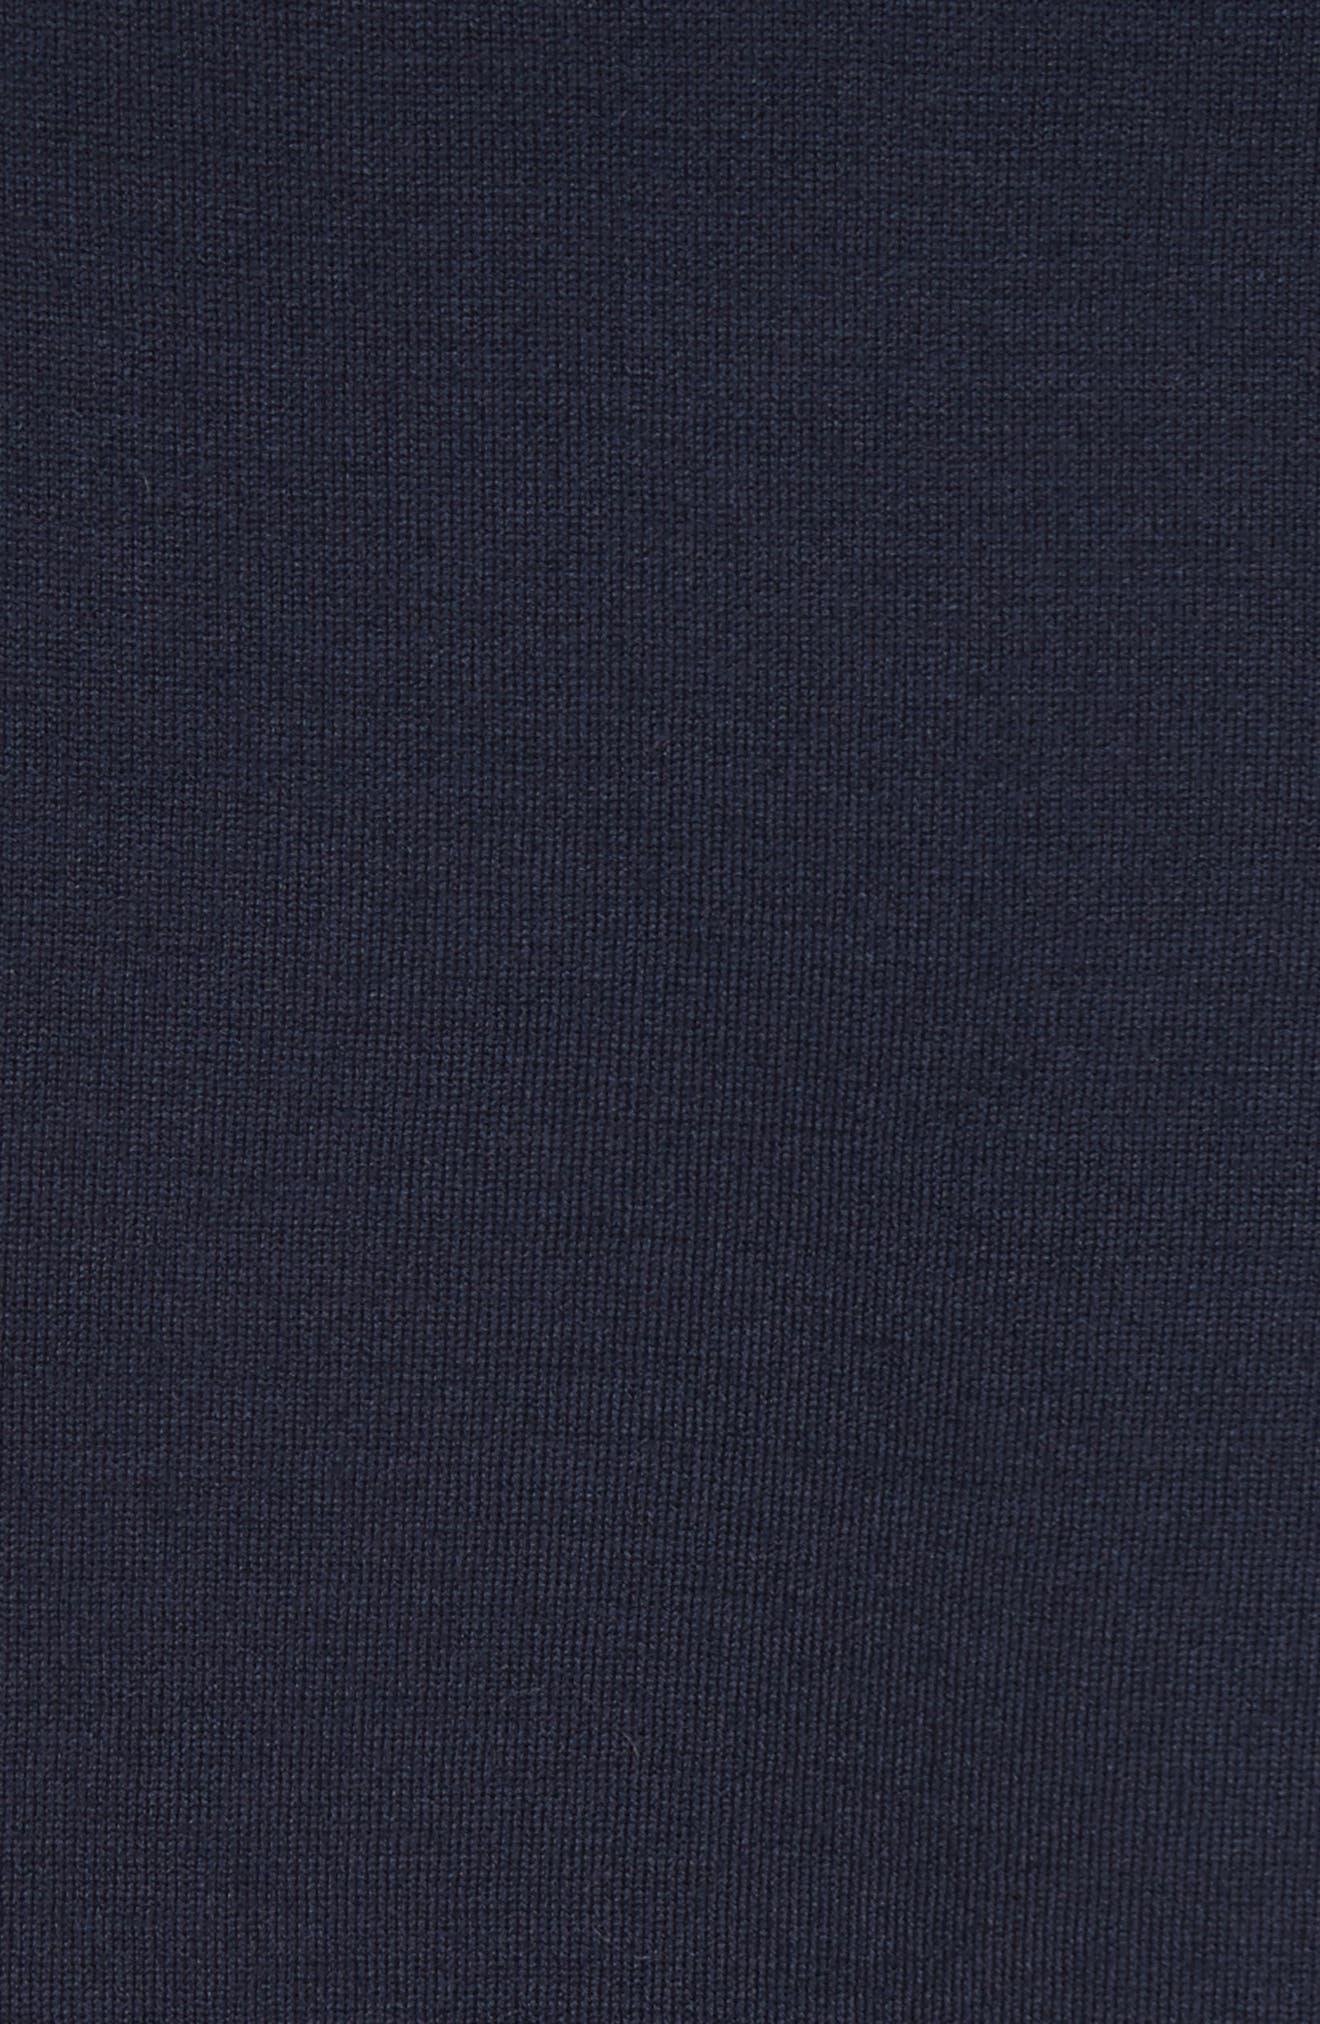 Ribbon Trim Milano Knit Cardigan,                             Alternate thumbnail 6, color,                             Navy